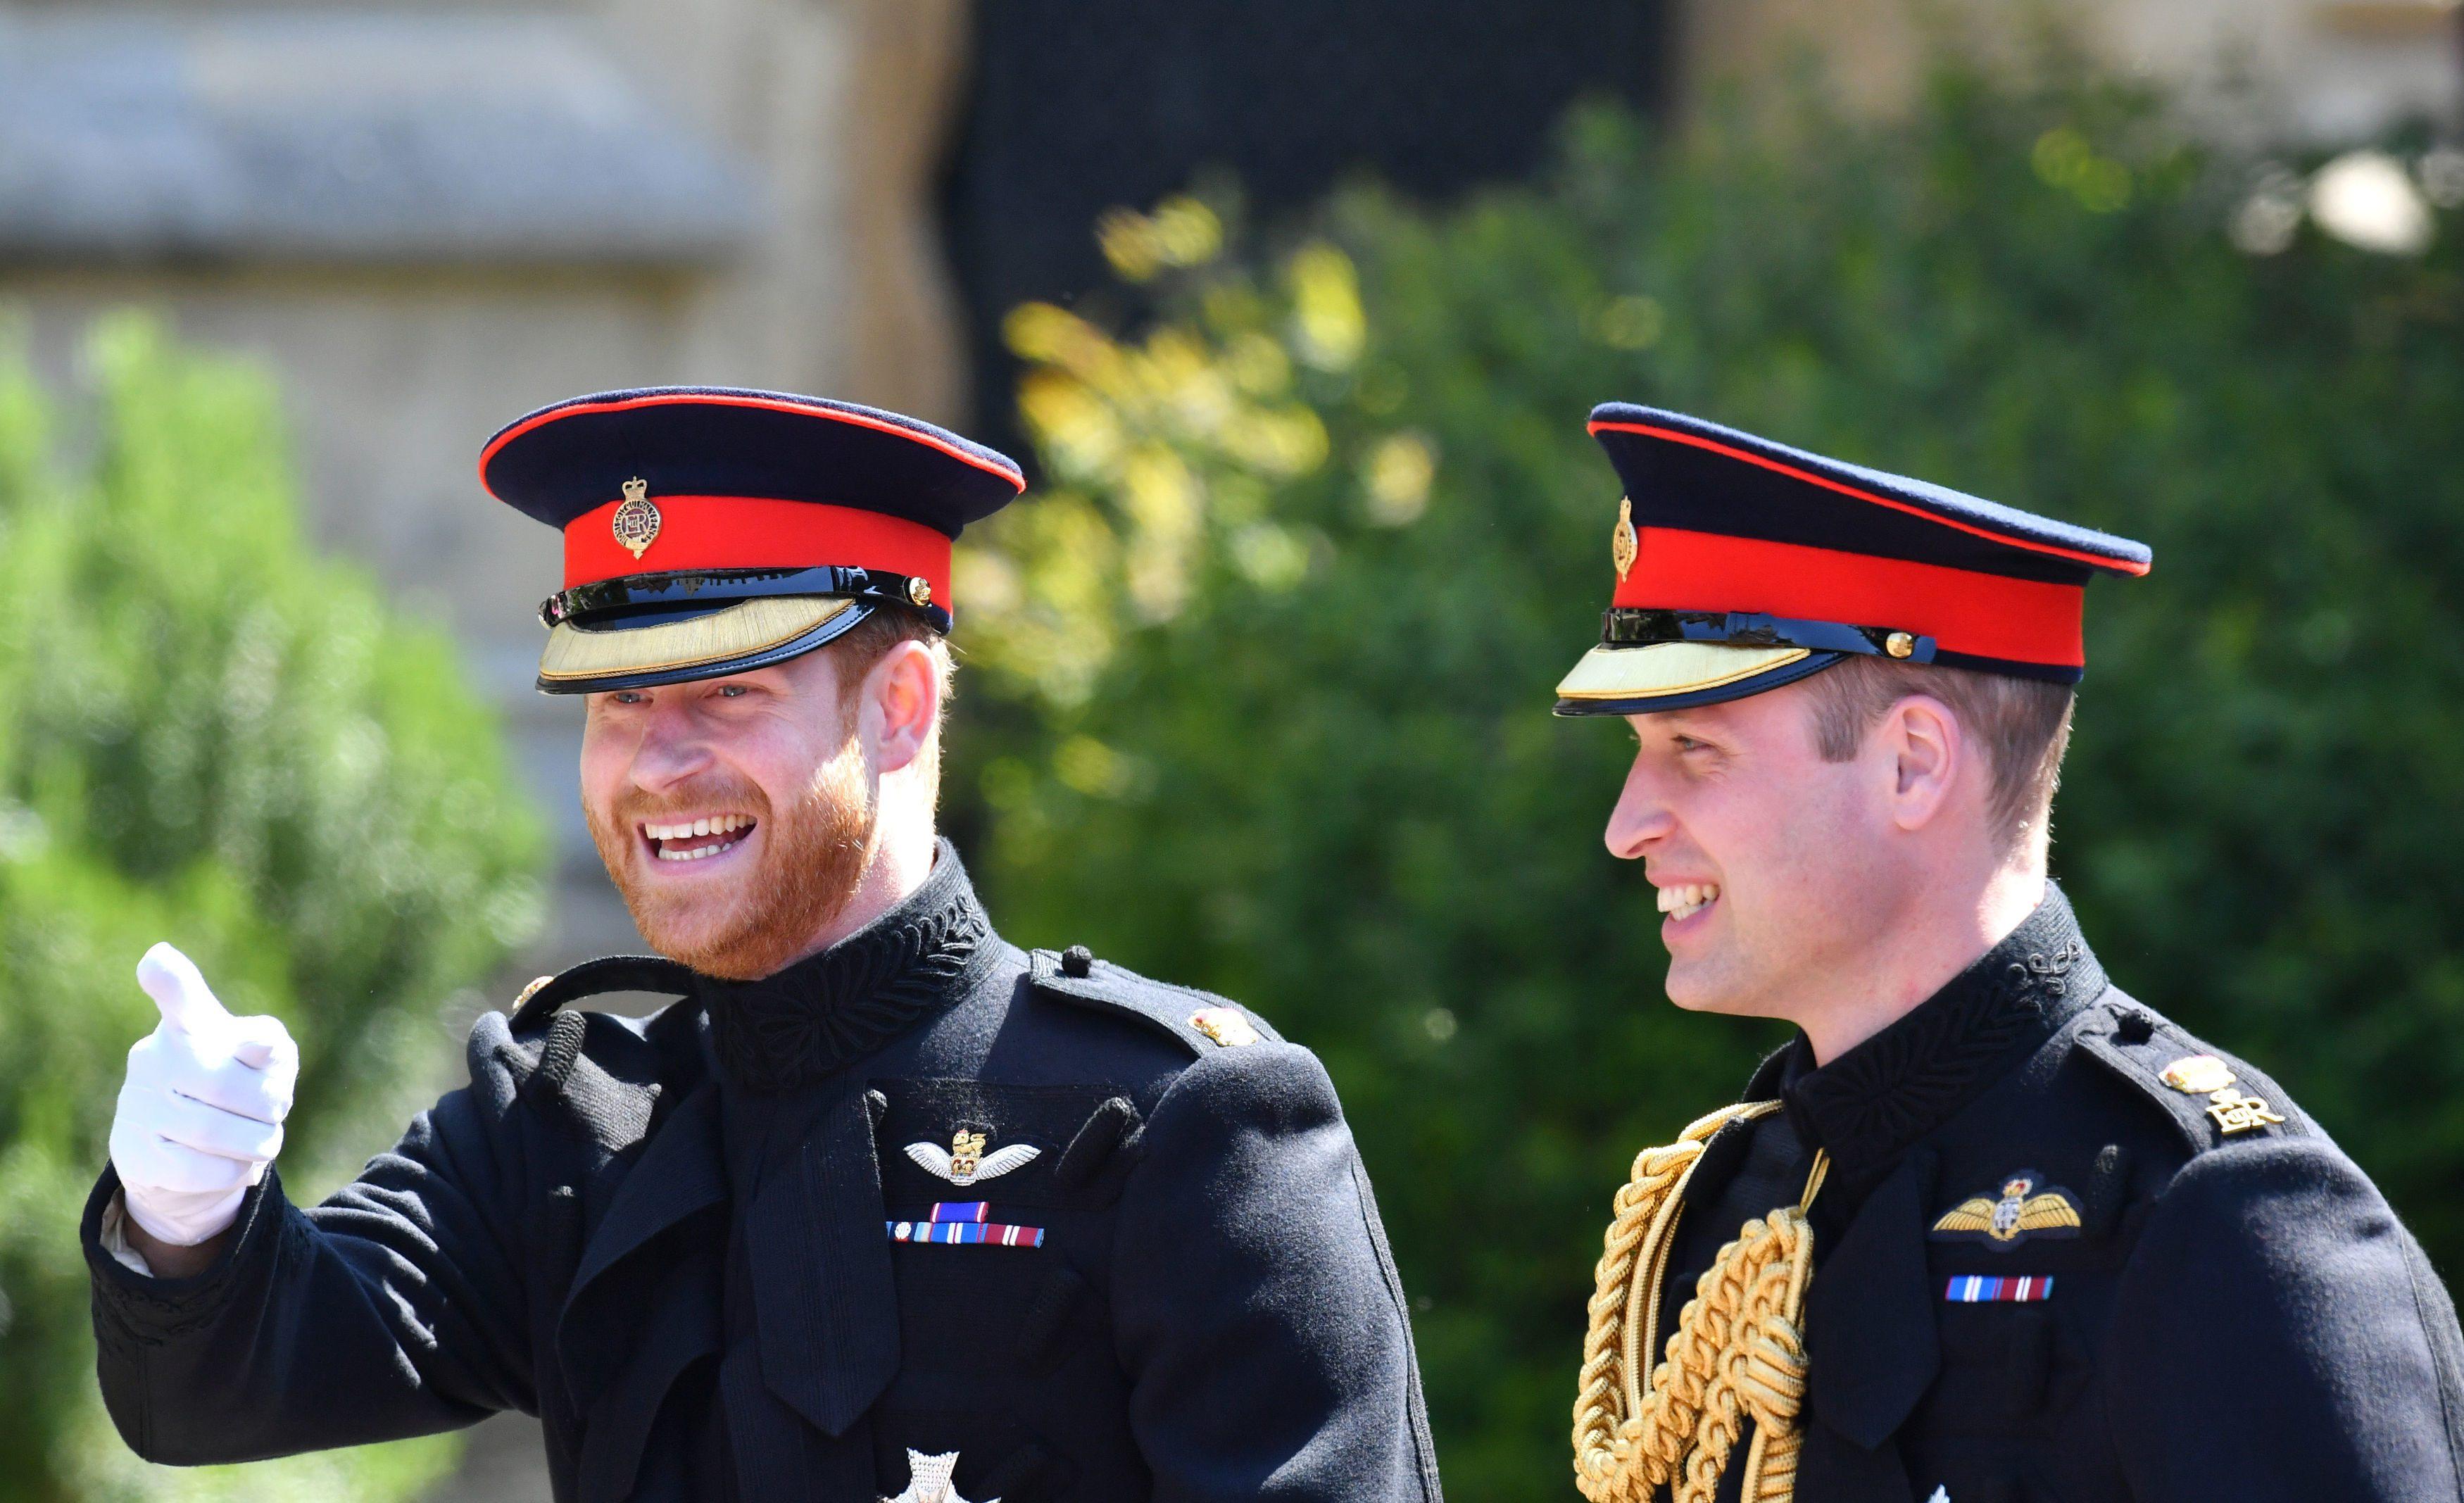 Harry sarà più ricco di William, ecco perché avrà un'eredità più cospicua